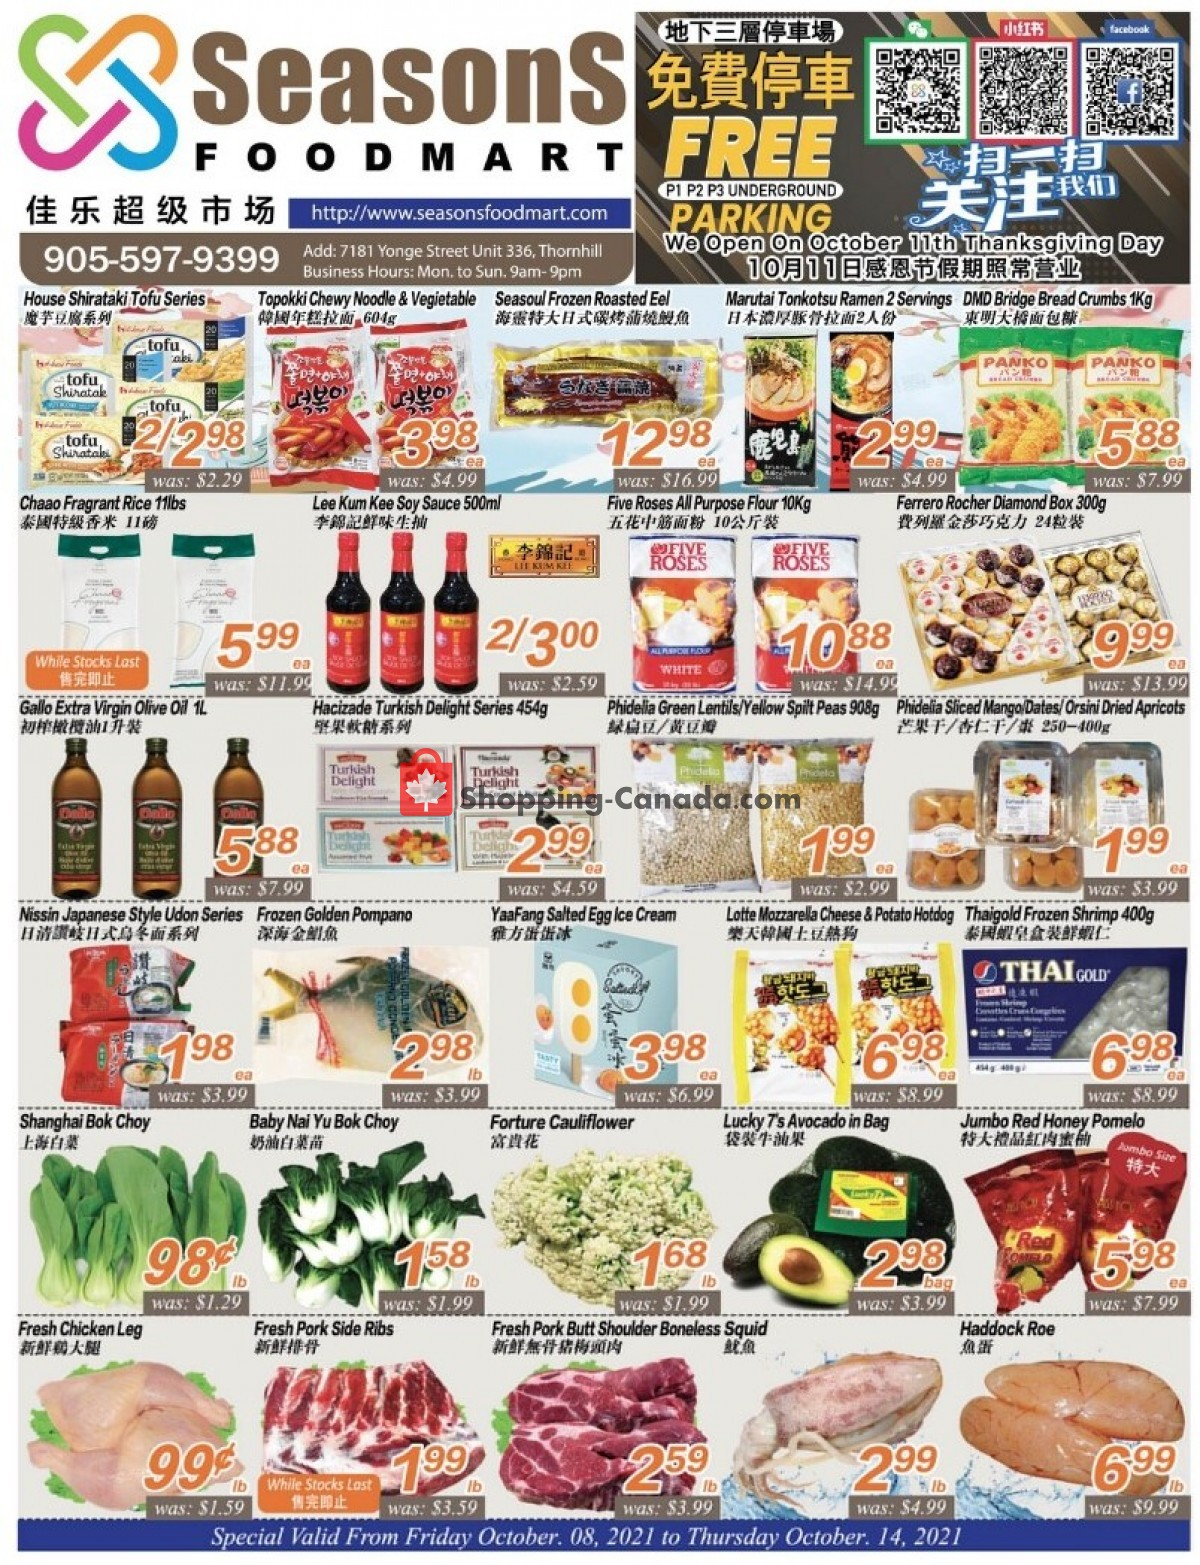 Flyer Seasons Food Mart Canada - from Friday October 8, 2021 to Thursday October 14, 2021